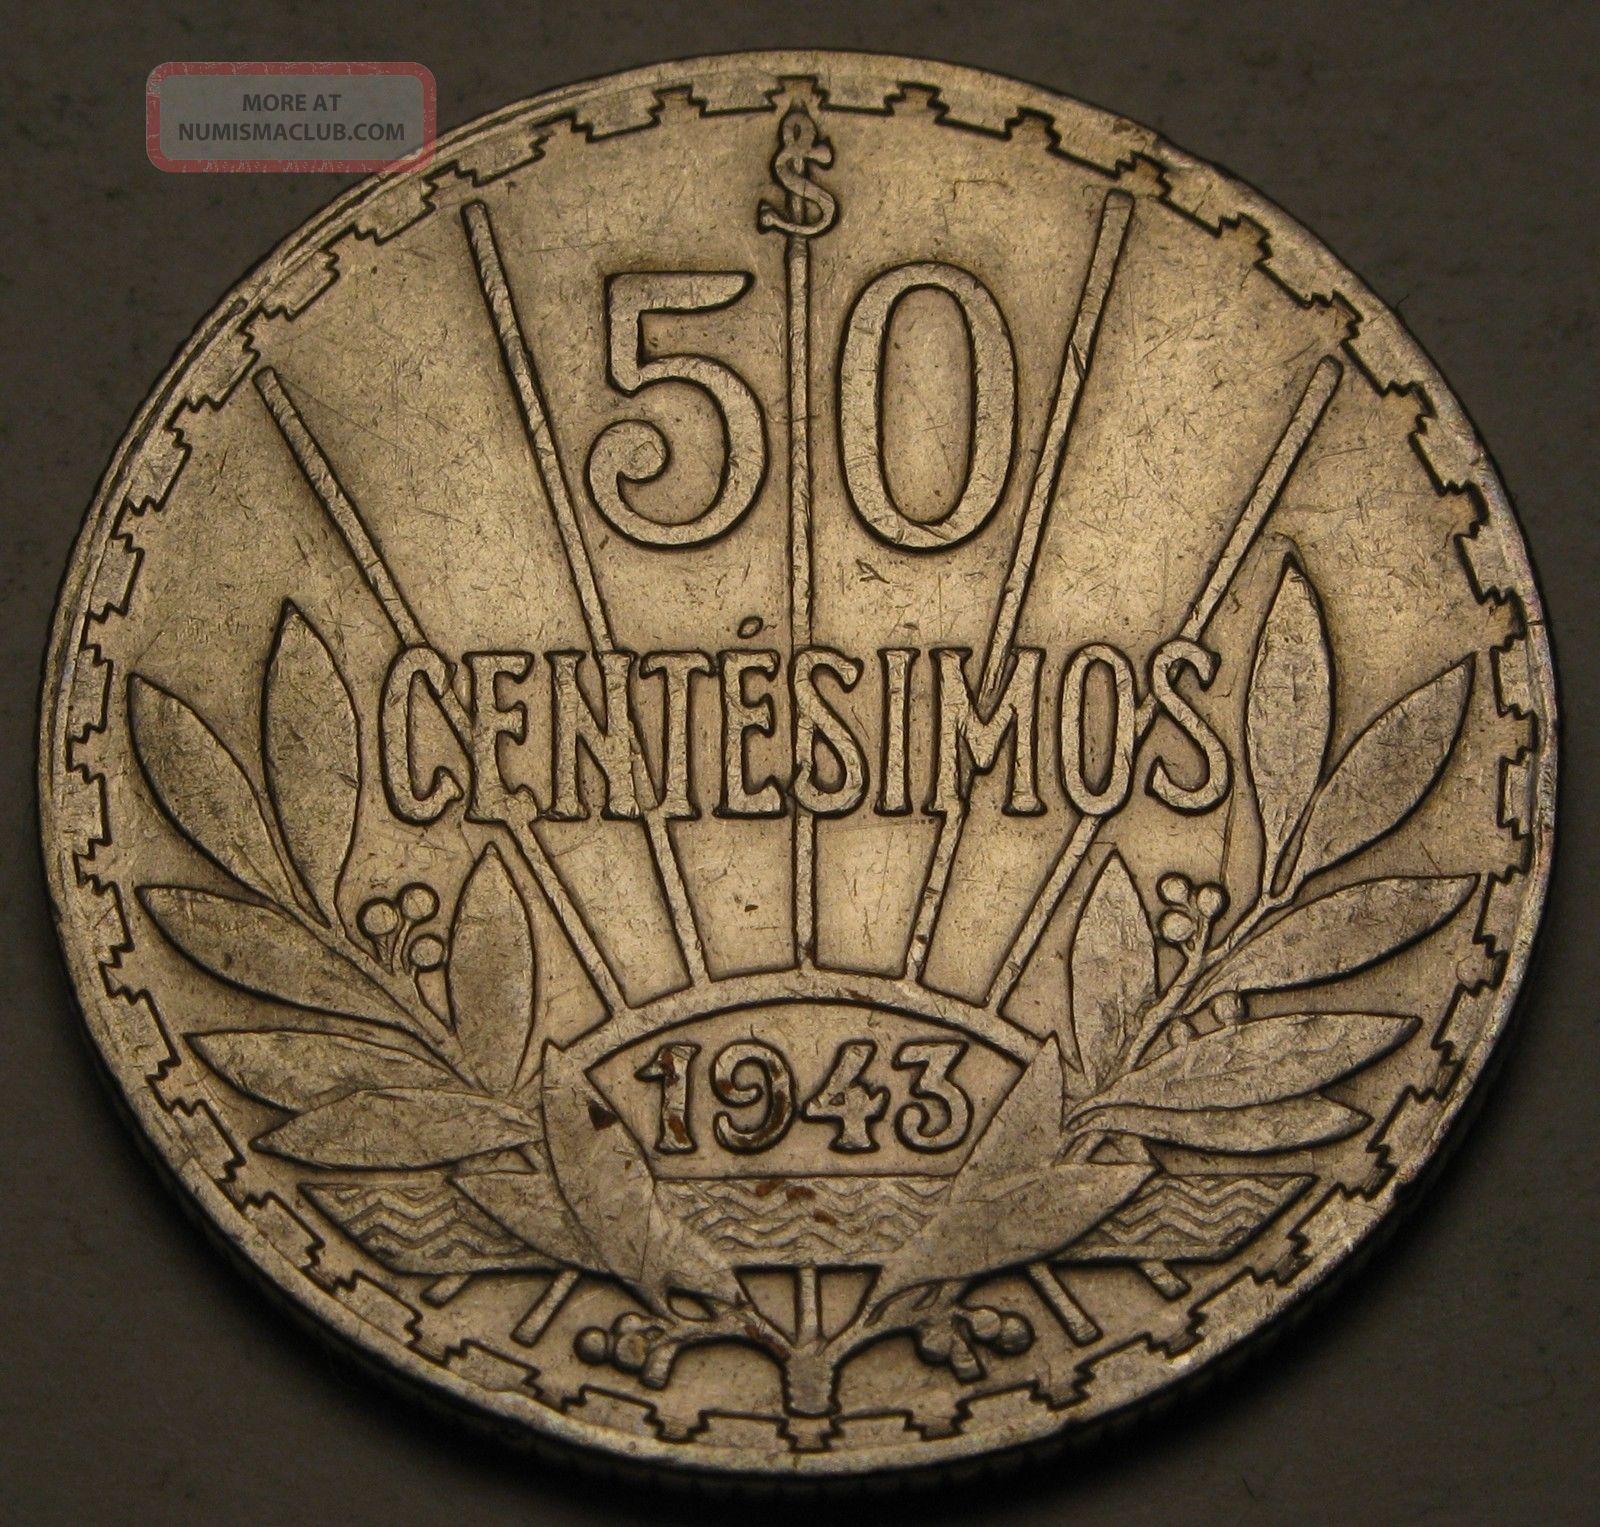 Uruguay 50 Centesimos 1943 So - Silver - Vf 813 South America photo